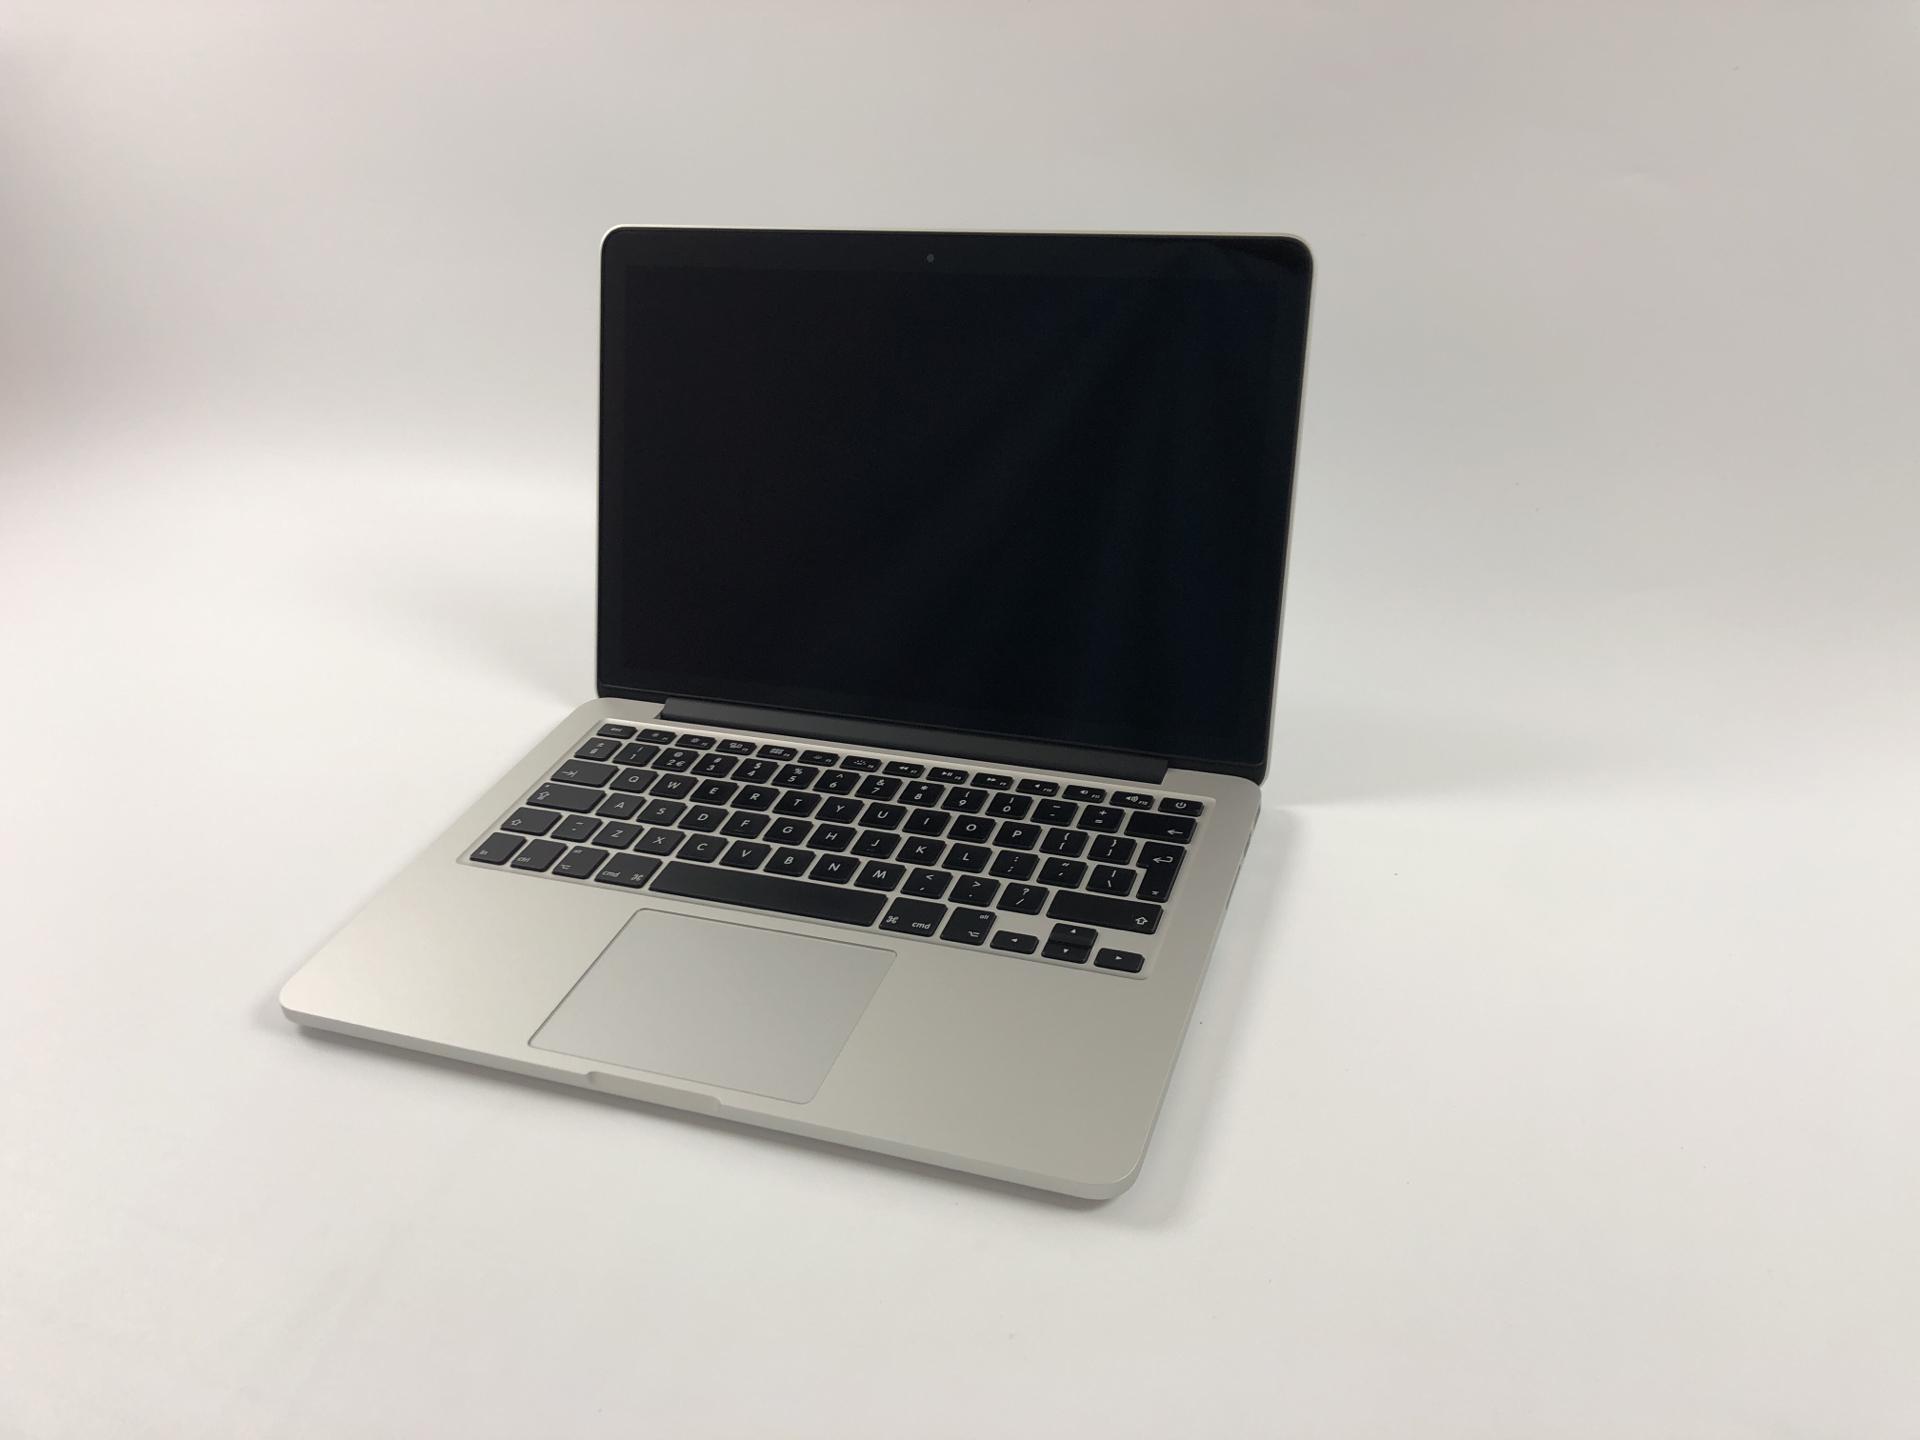 "MacBook Pro Retina 13"" Early 2015 (Intel Core i5 2.7 GHz 16 GB RAM 128 GB SSD), Intel Core i5 2.7 GHz, 16 GB RAM, 128 GB SSD, bild 1"